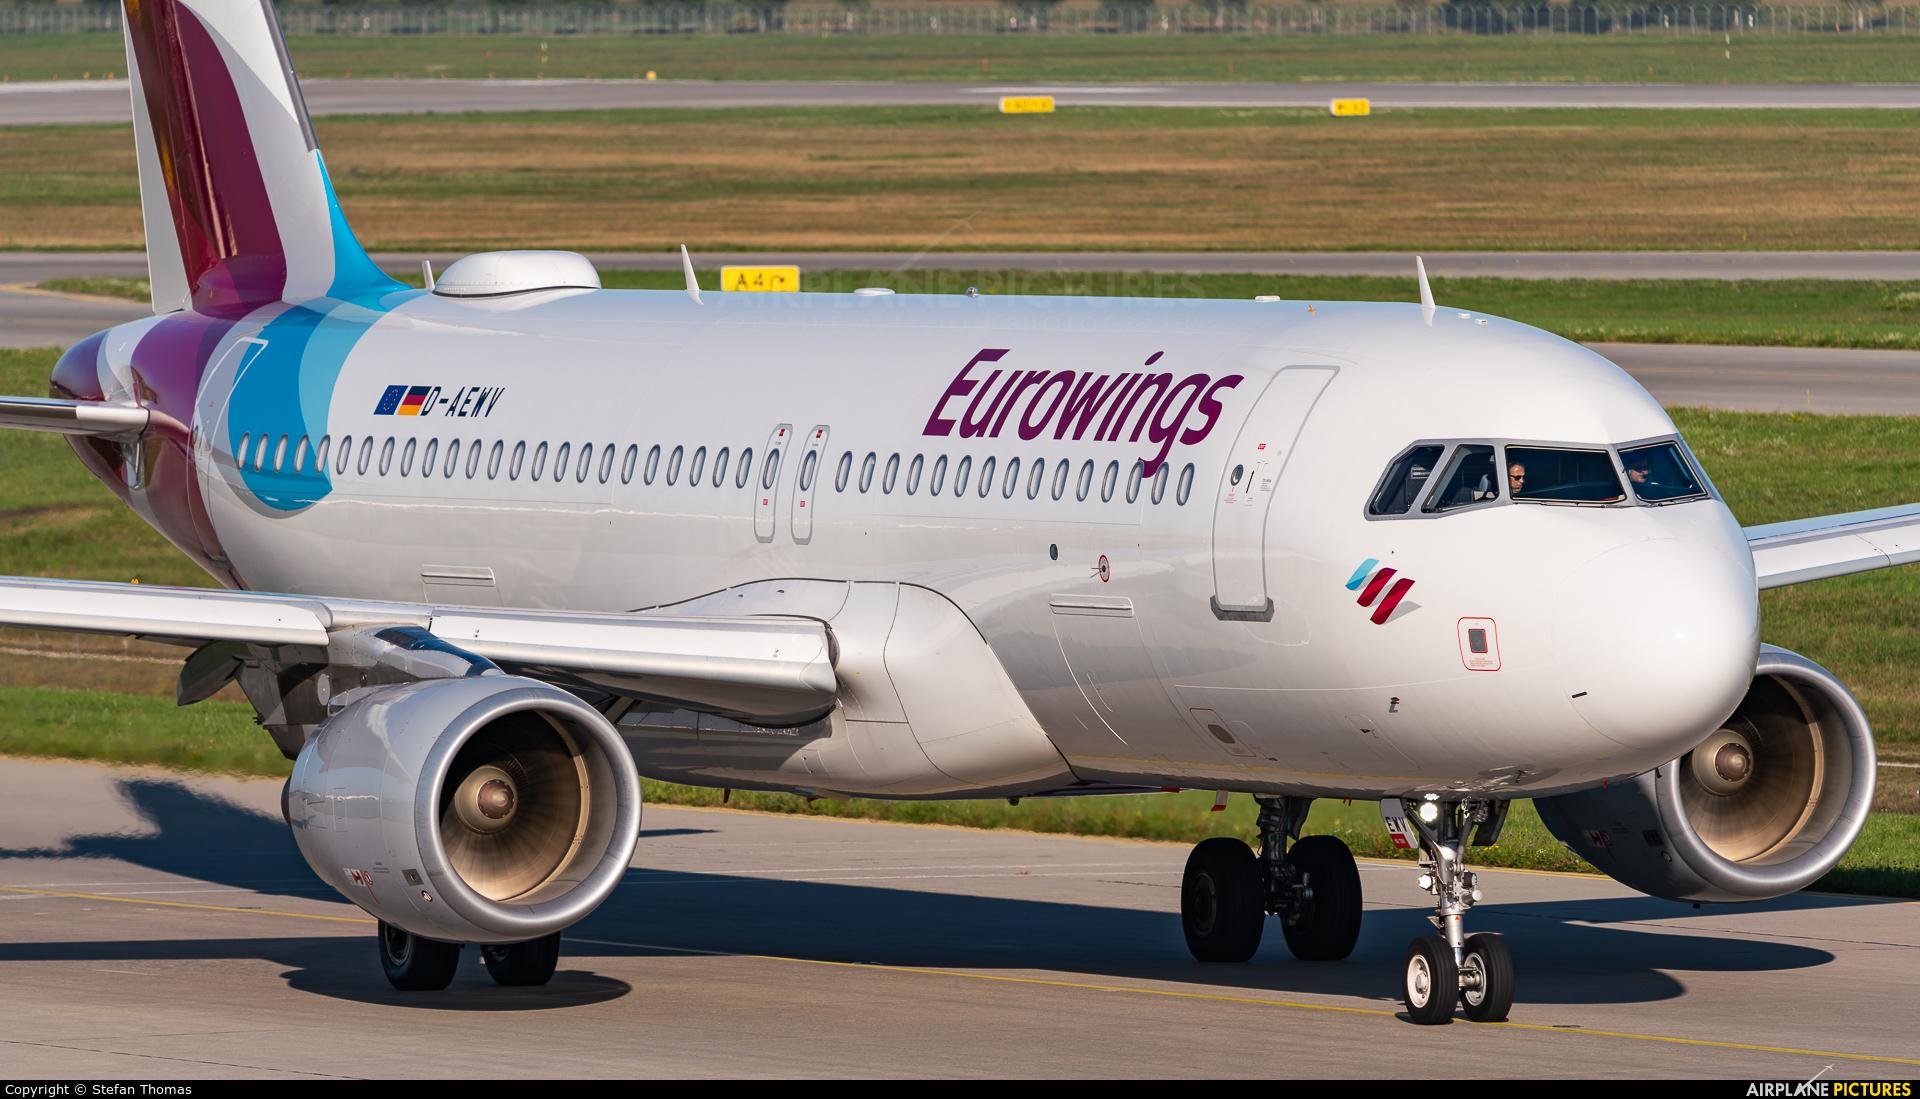 Eurowings D-AEWV aircraft at Munich